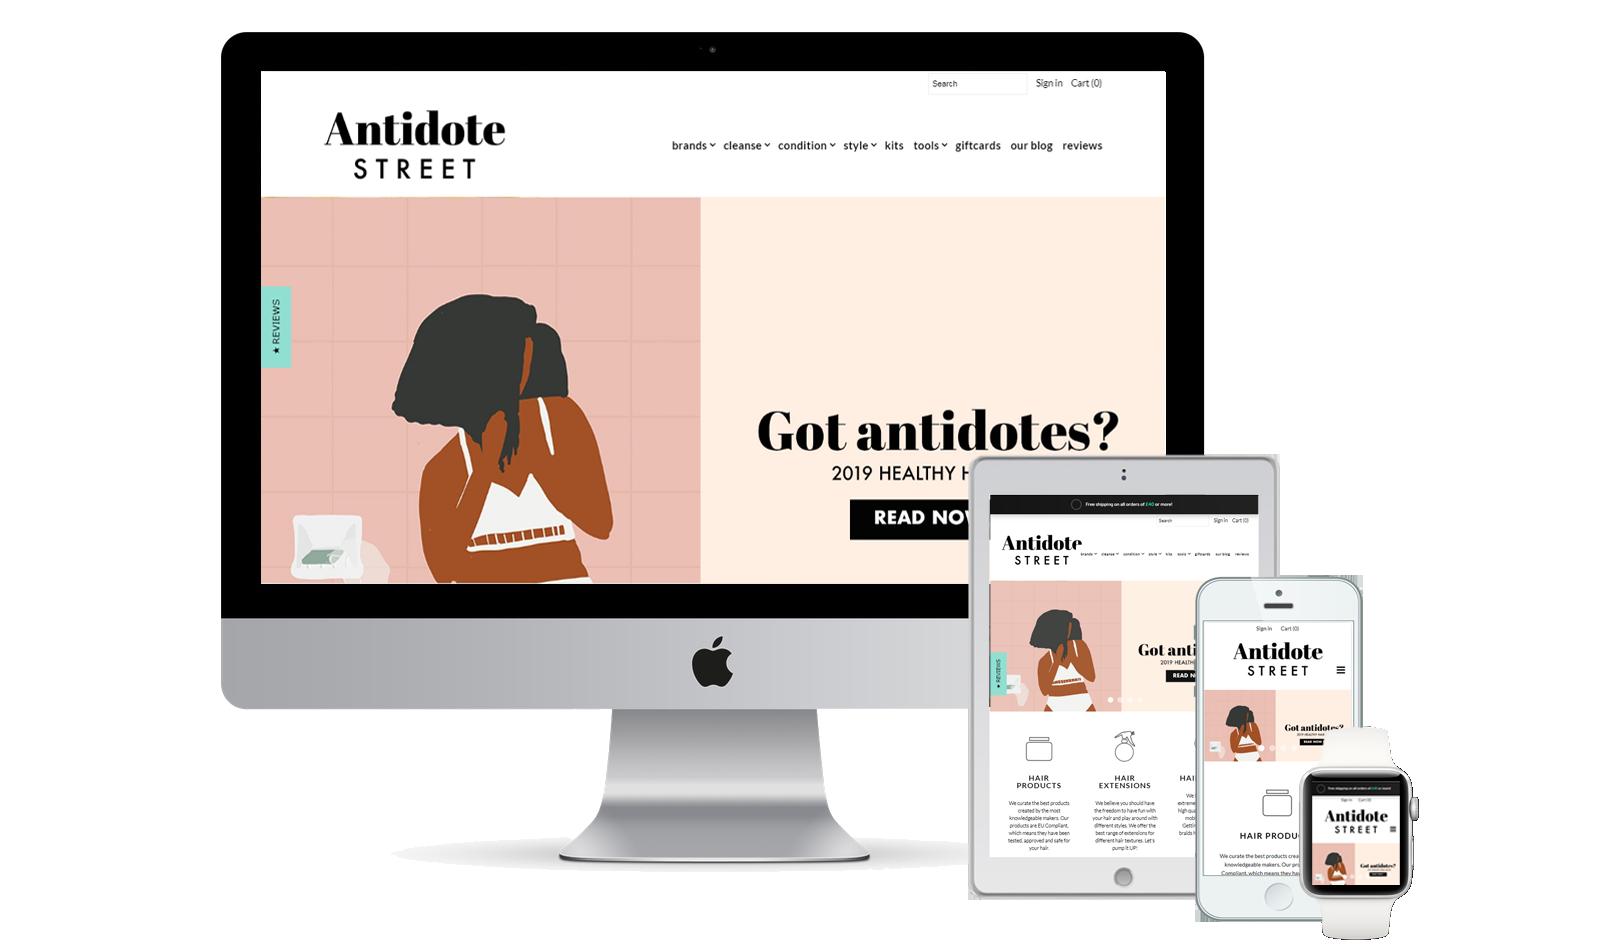 Antidote Street